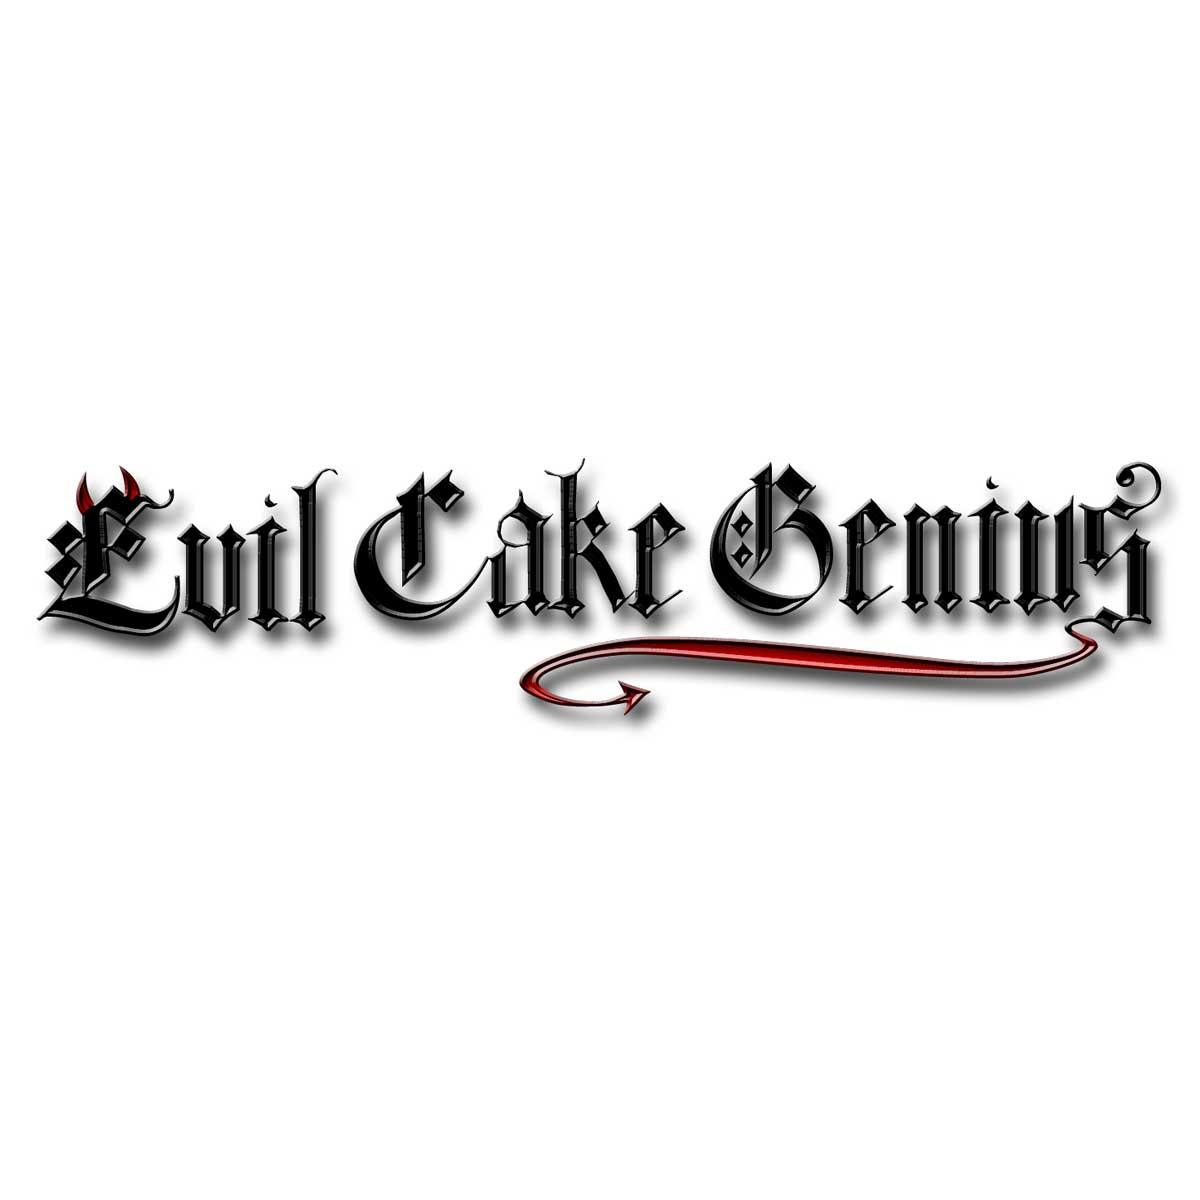 Impression Mat Tufted Swiss Dots Evil Cake Genius